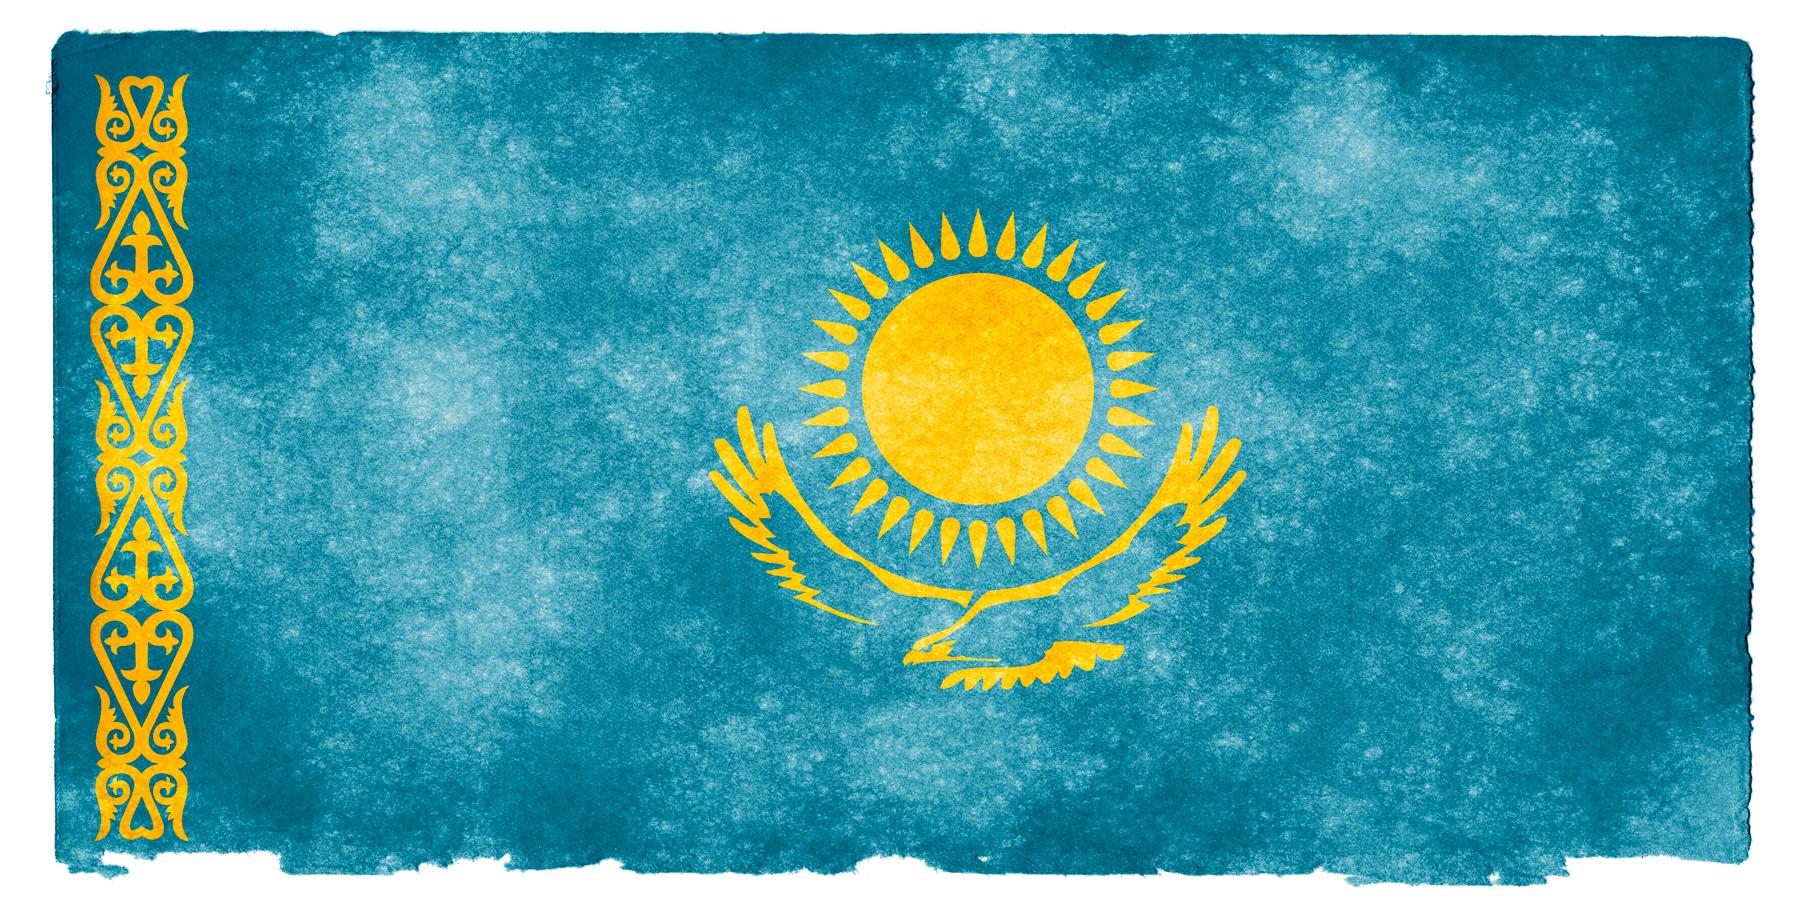 Kazakhstan Grunge Flag, Aged, Proud, Kazakhstan, Nation, HQ Photo